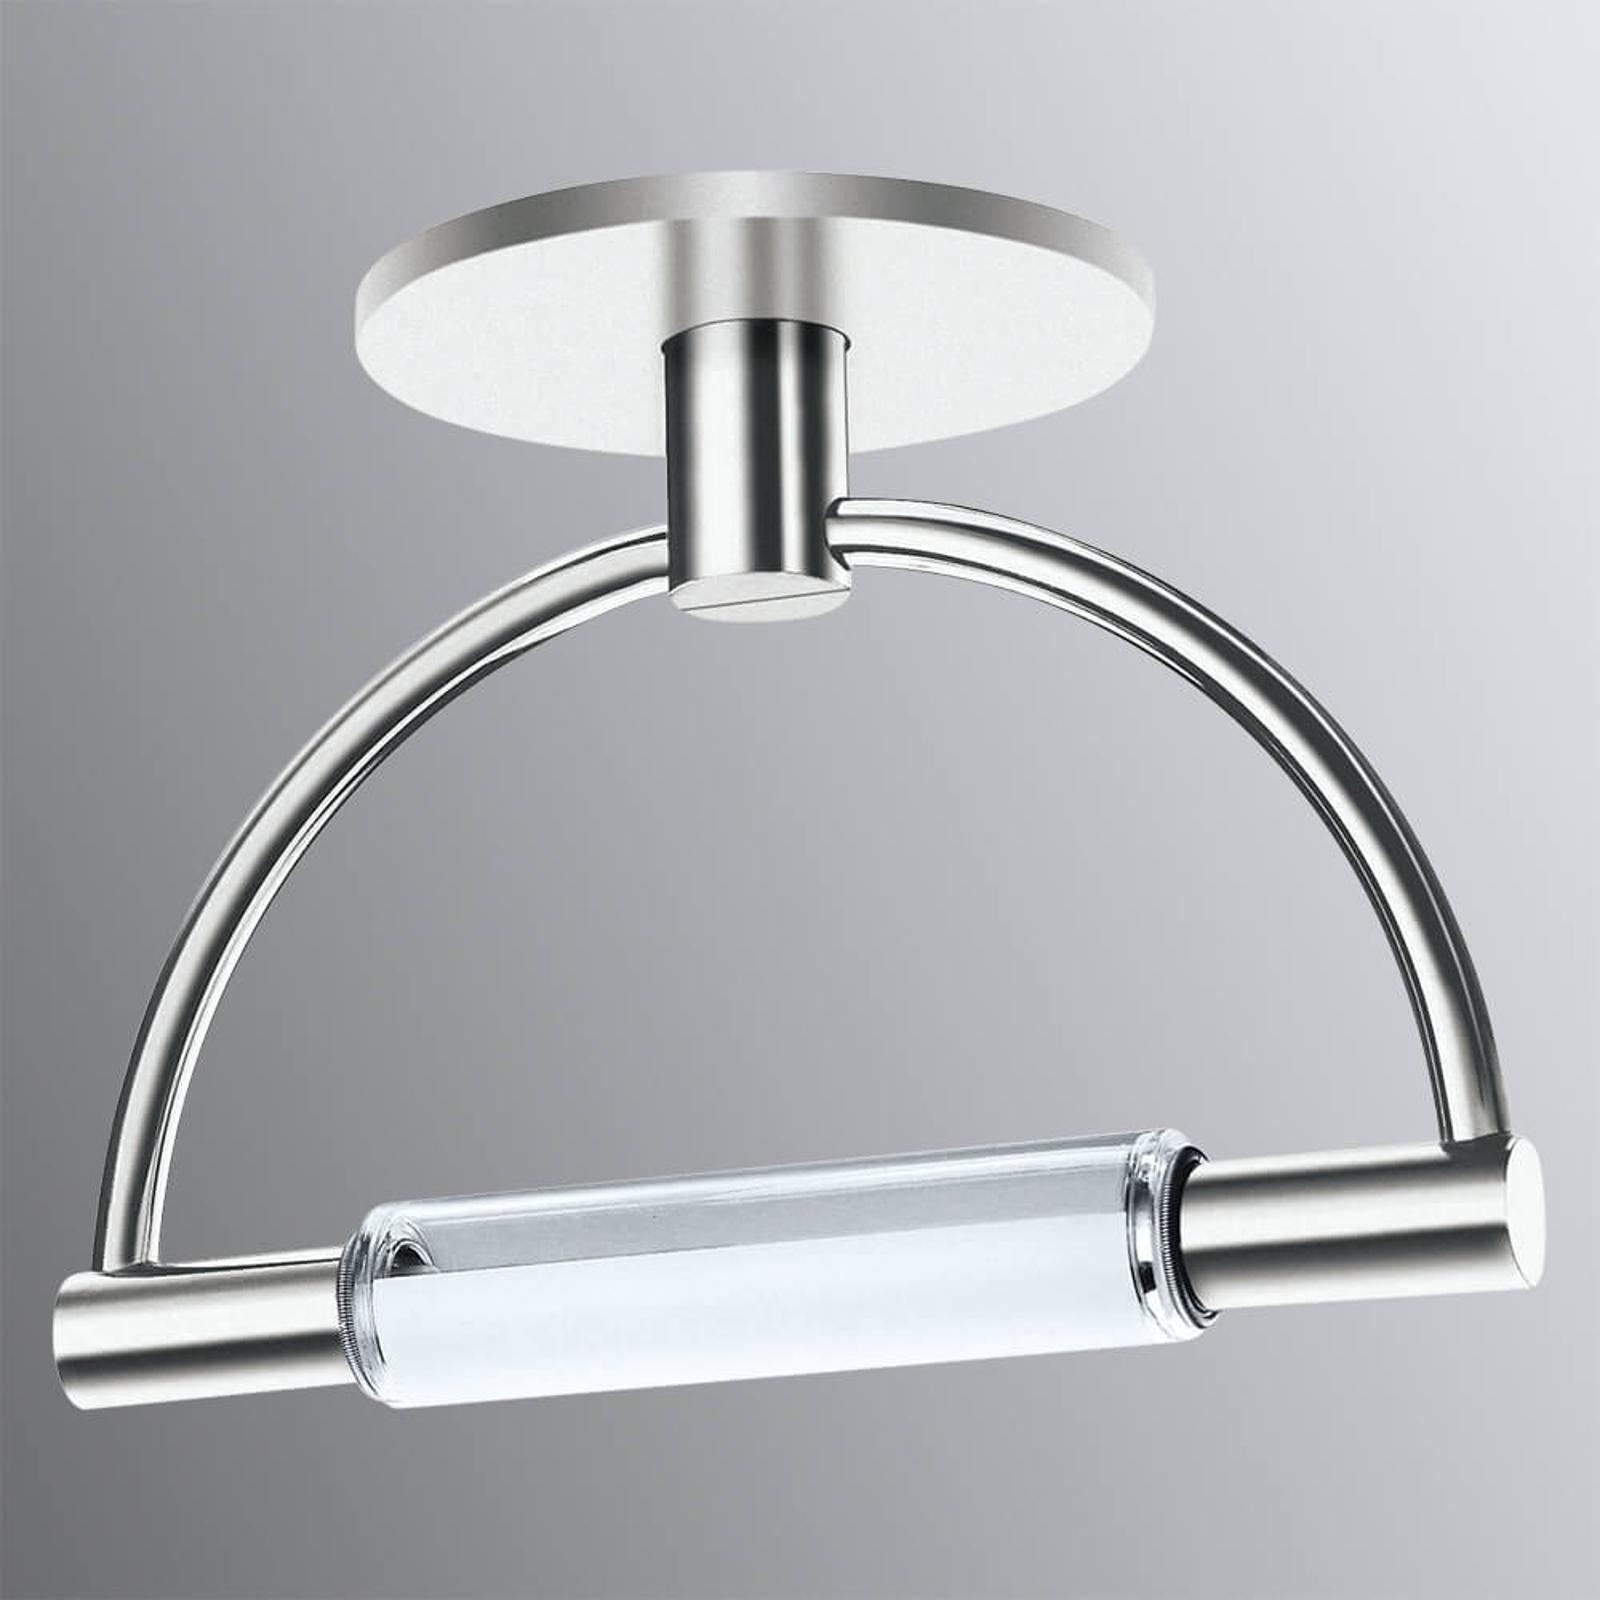 Topmoderne LED loftlampe Gradi m. blændbeskyttelse